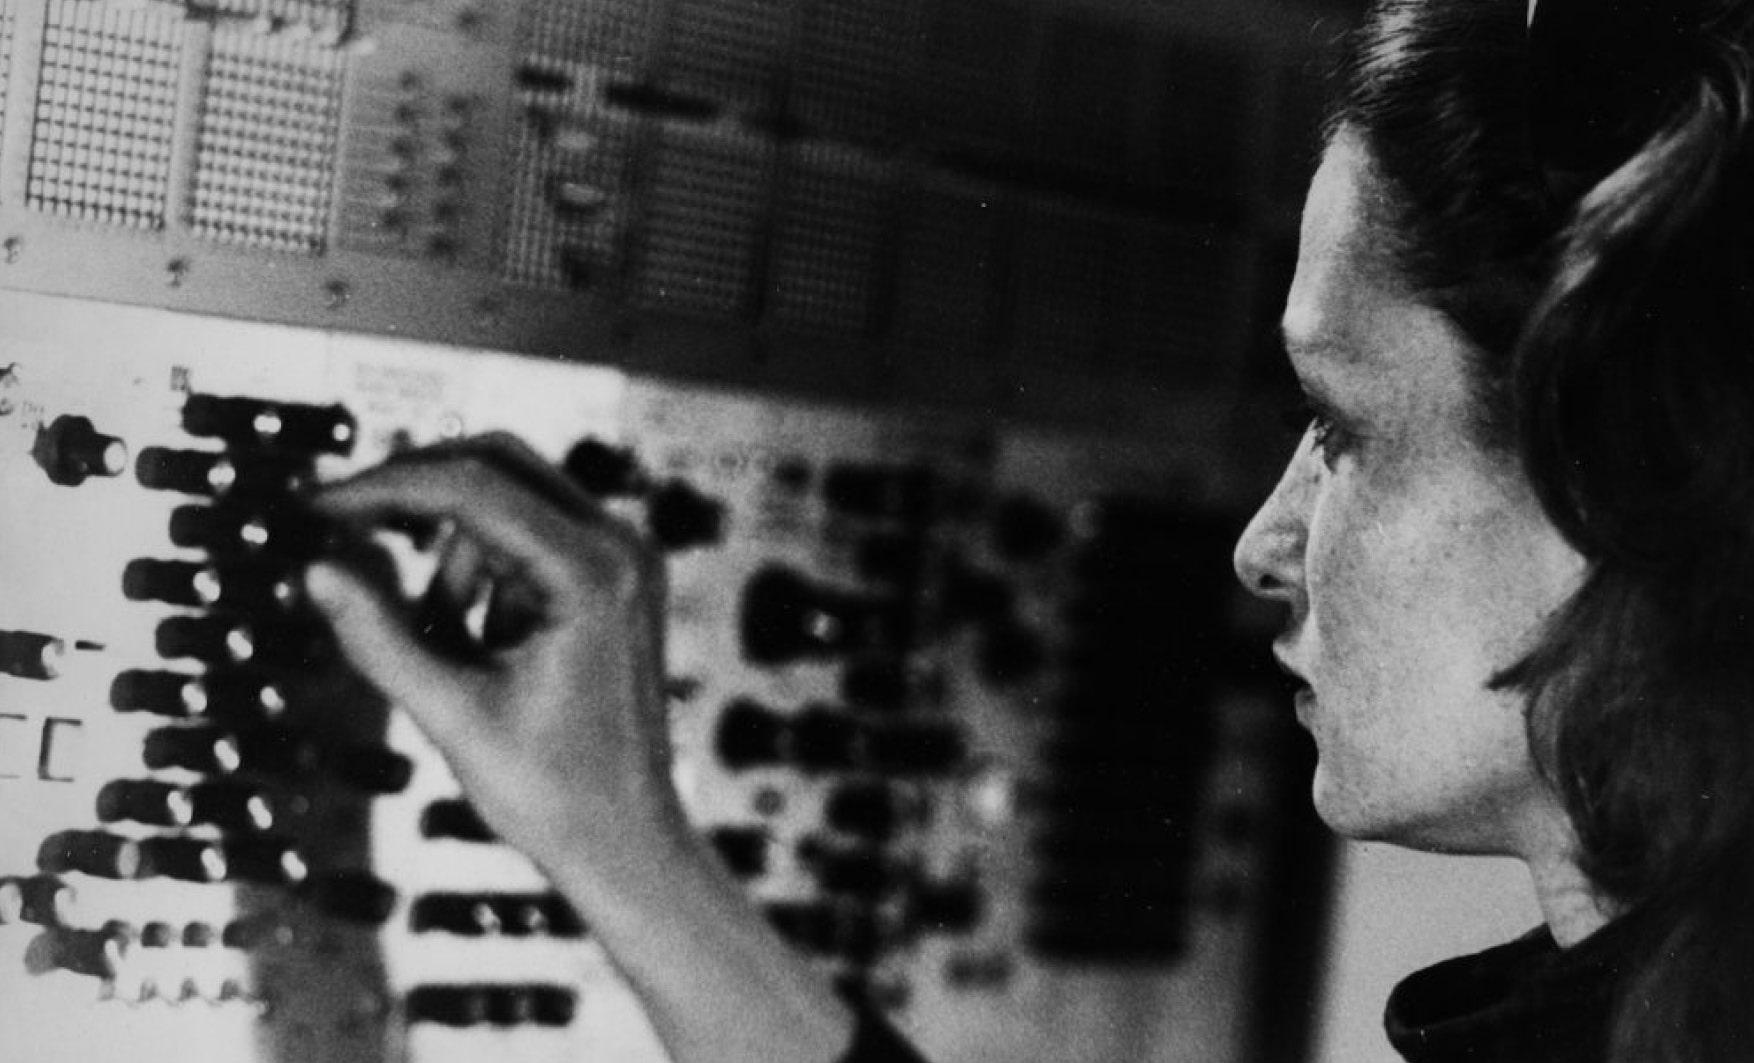 Éliane Radigue in her studio, Paris, ca. 1970s. Photo: Yves Arman